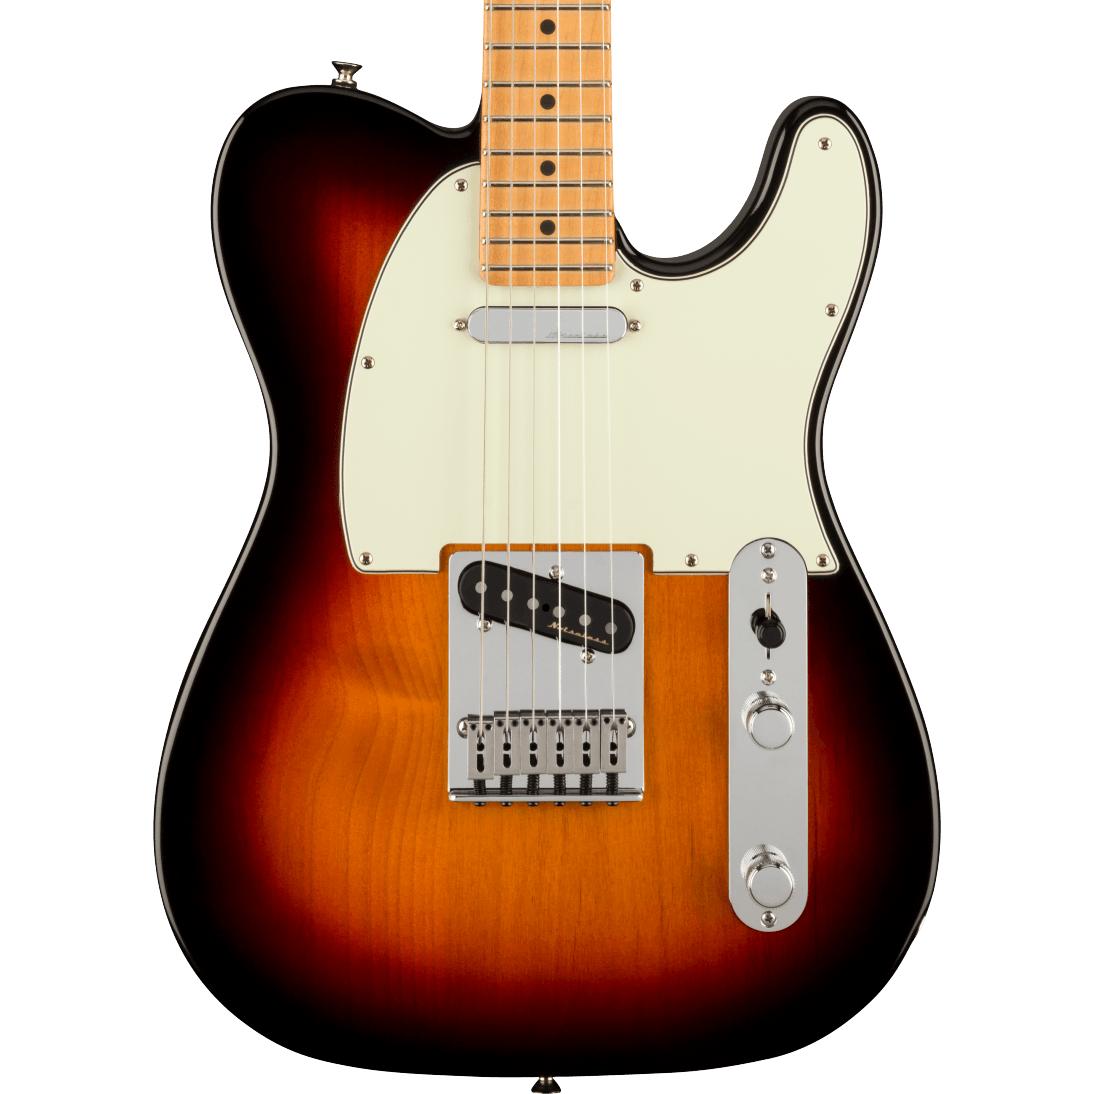 Fender Player Plus Telecaster - Maple Fingerboard, 3-Color Sunburst